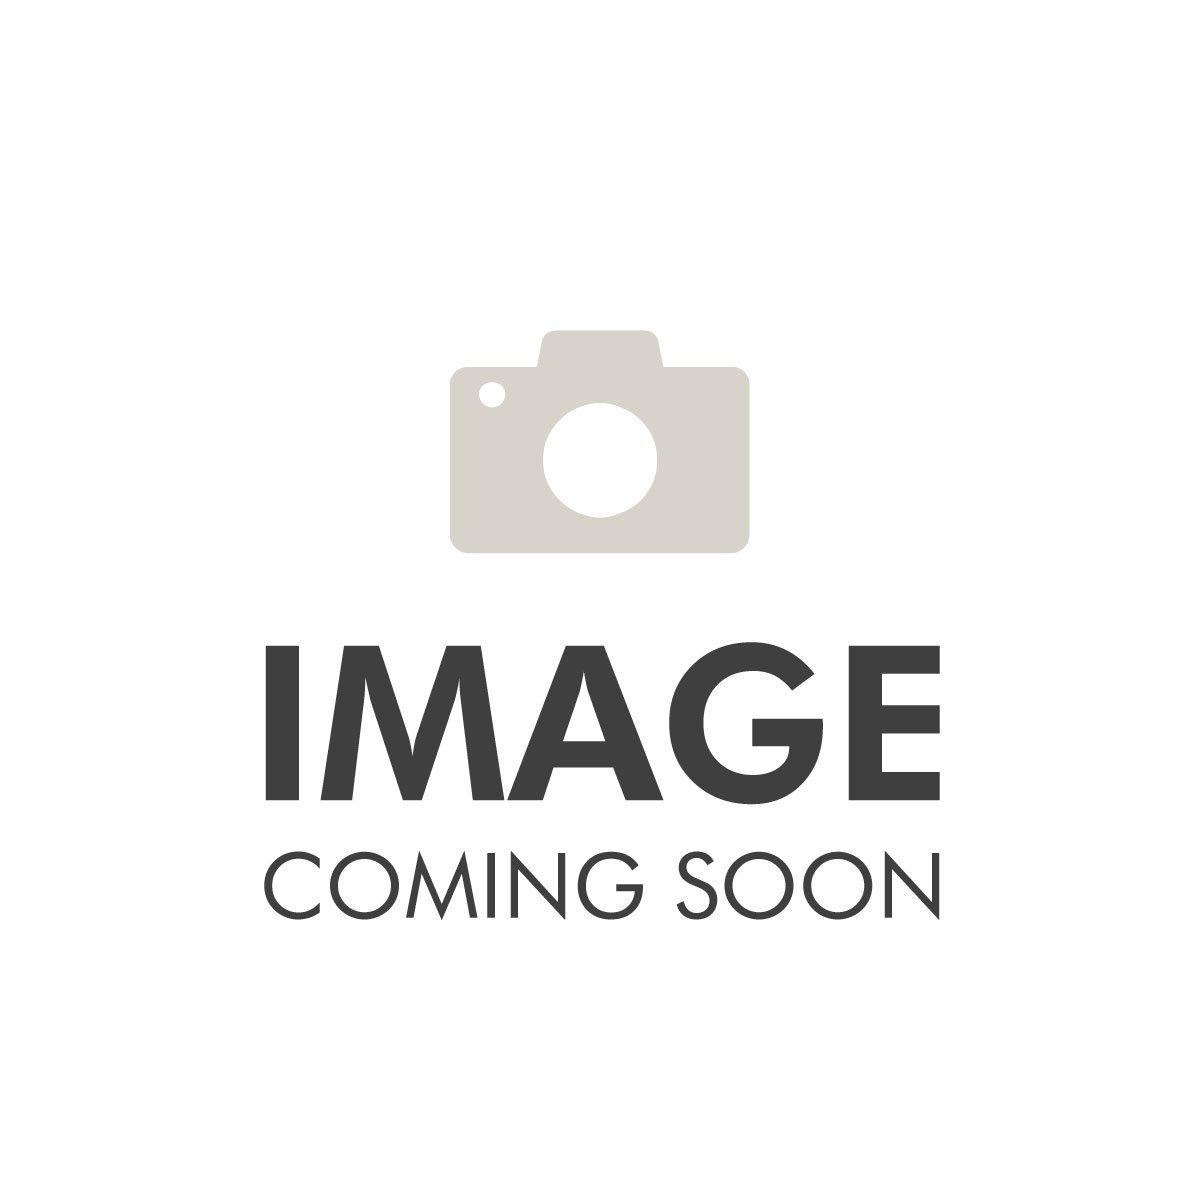 Clarins Travel Exclusive Eyebrow Kit 3 Eyebrow Shades & 1 Cire